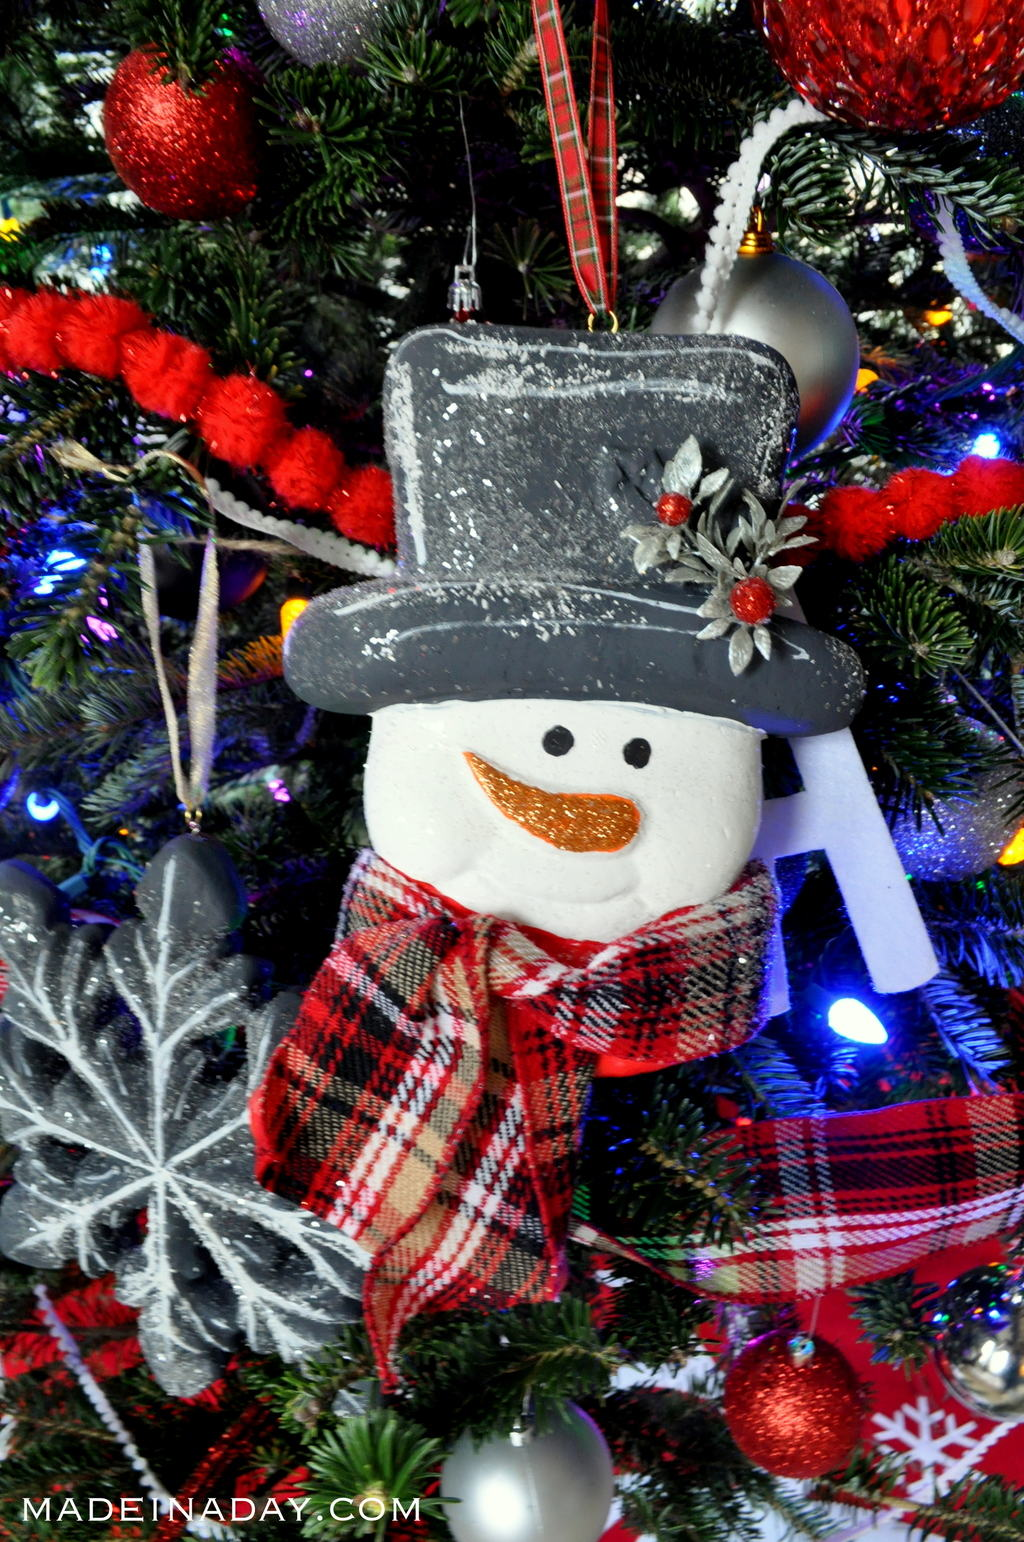 Chalkboard Snow Flocked Snowman Ornament madeinaday.com